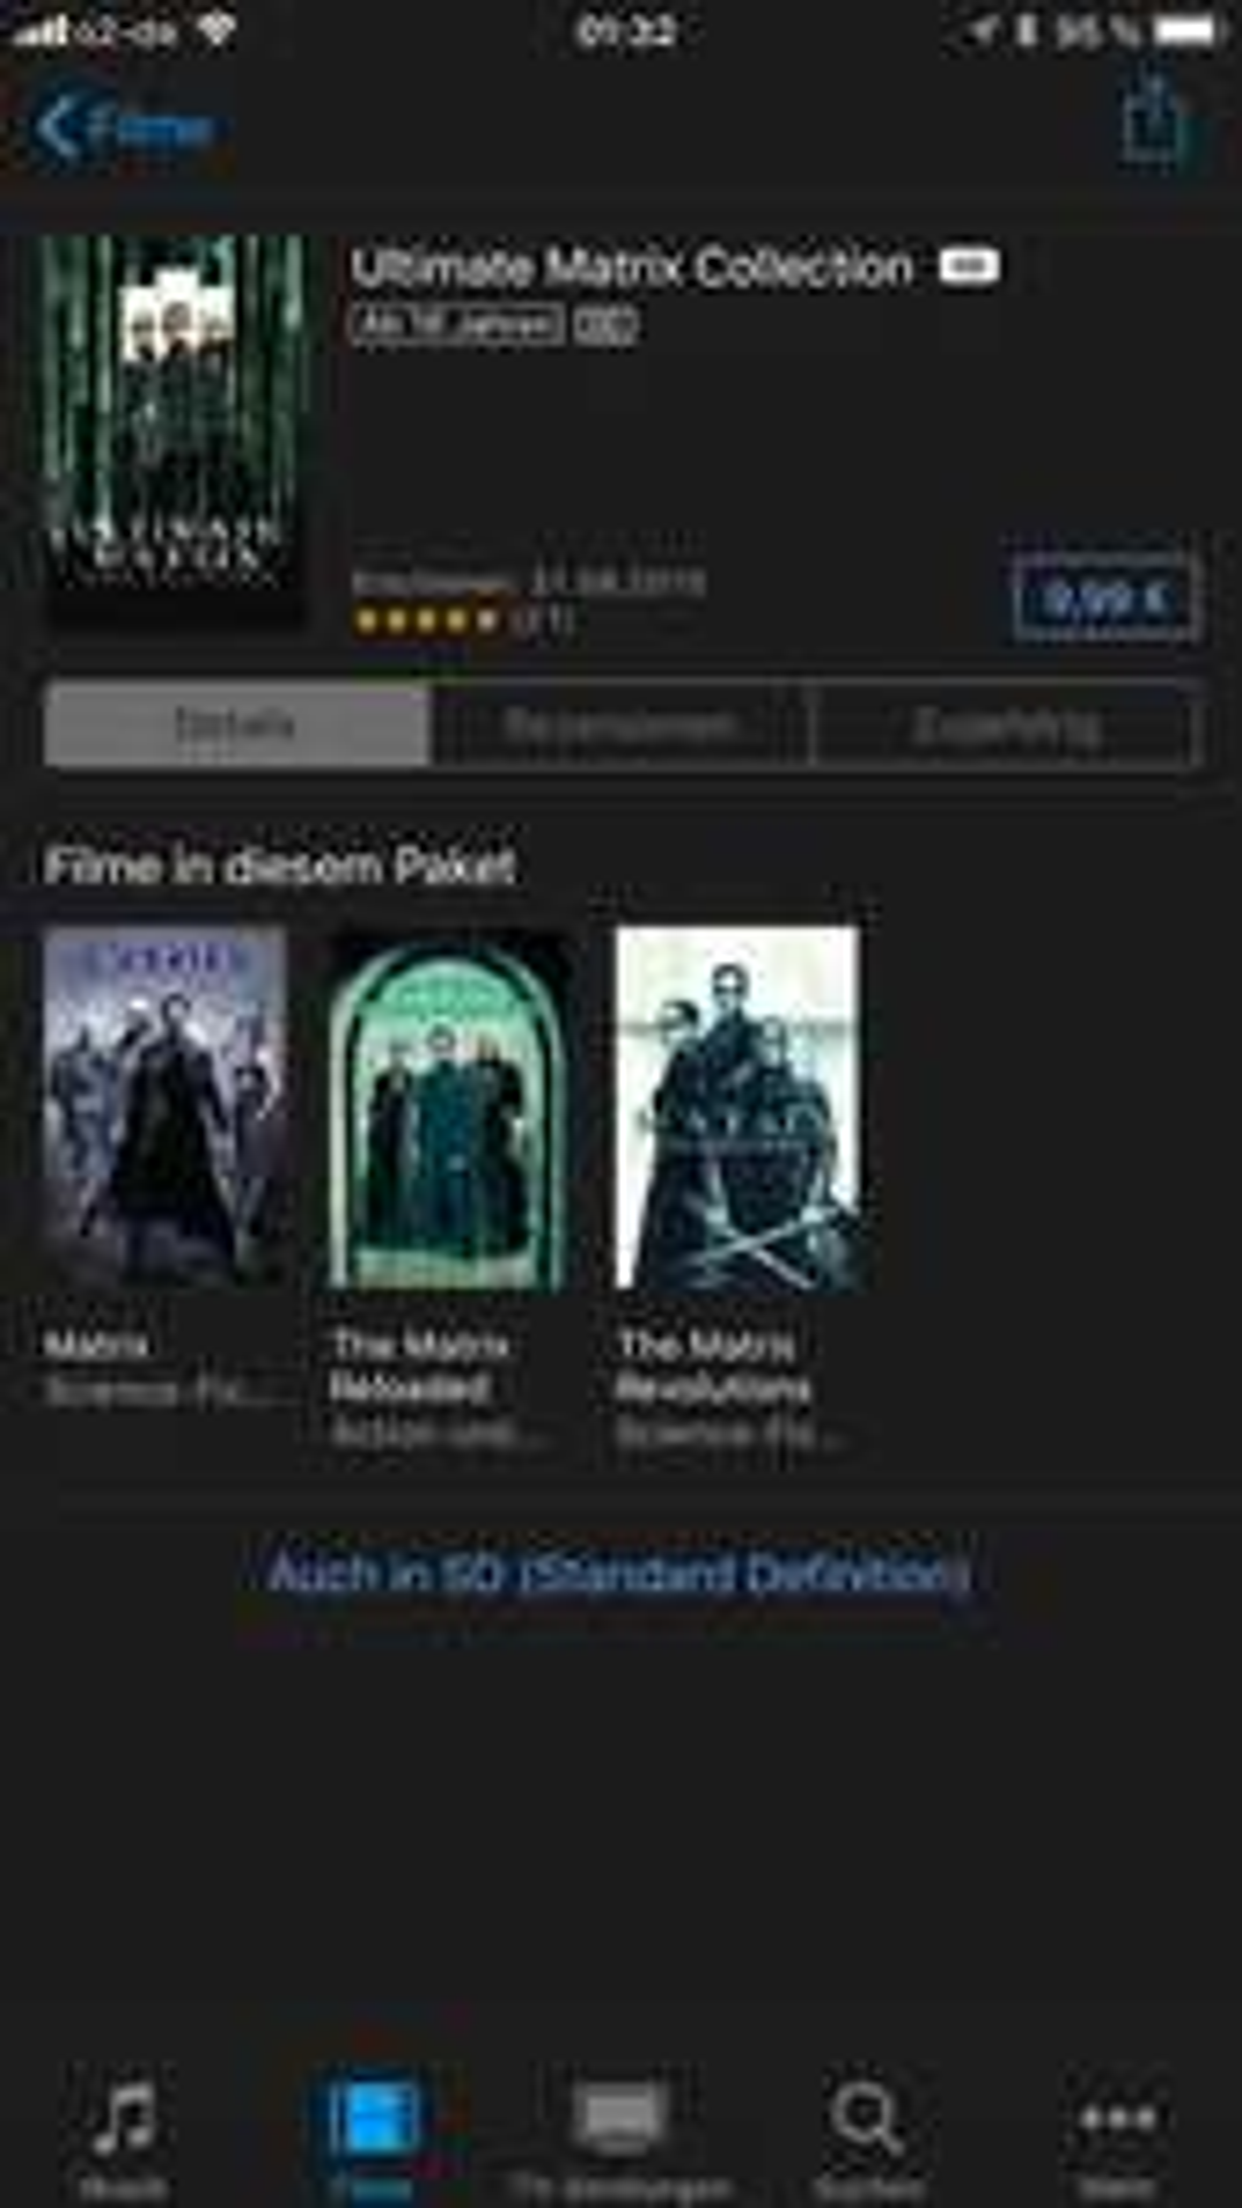 iTunes - Ultimate Matrix Collection (Trilogie)